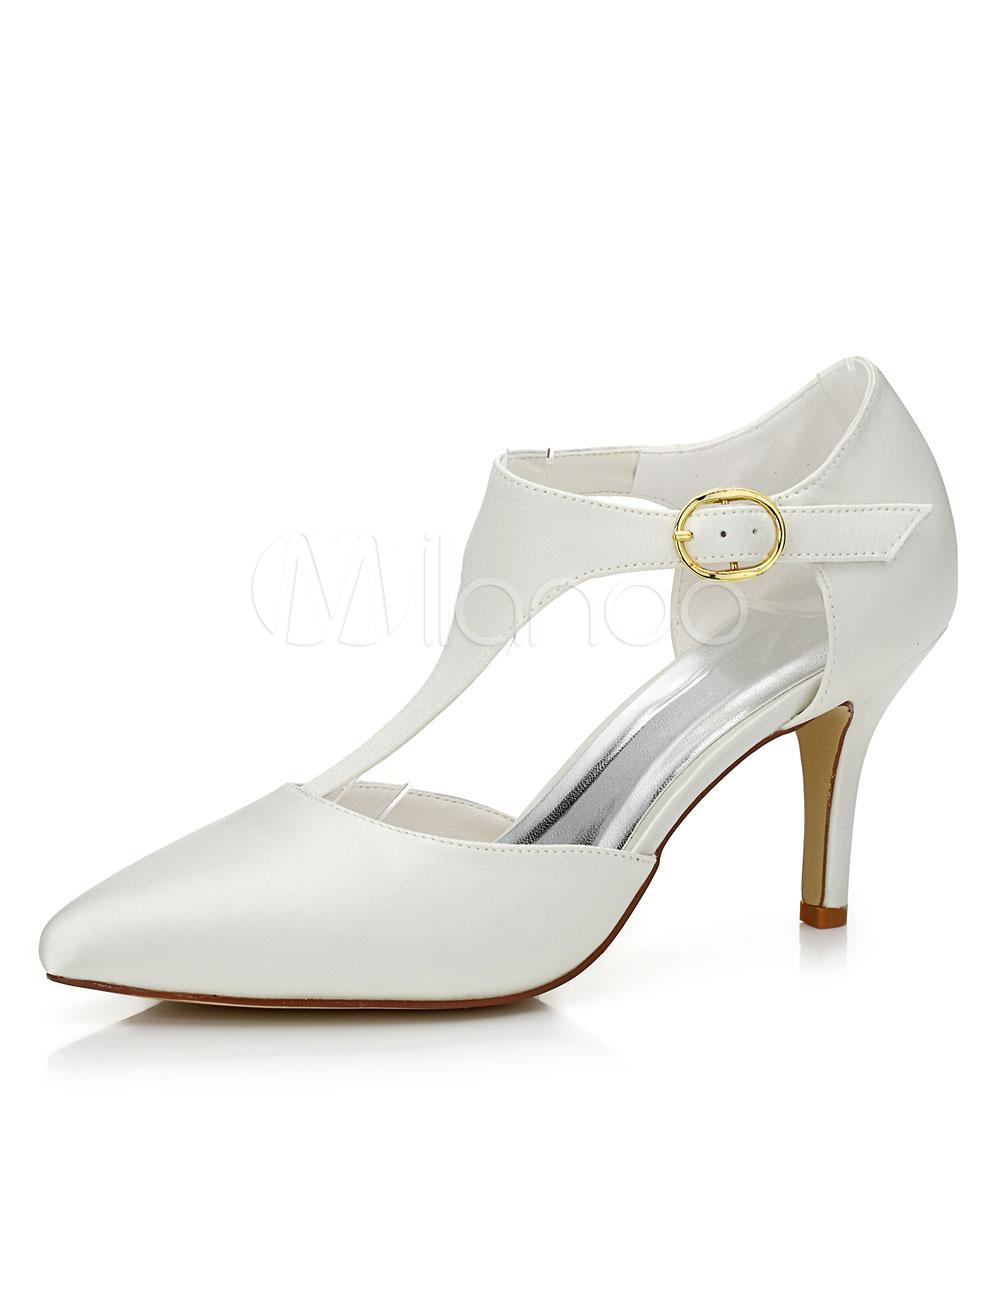 Beige Wedding Shoes Pointed T-strap Buckle Elegant High Heel Bridal Shoes